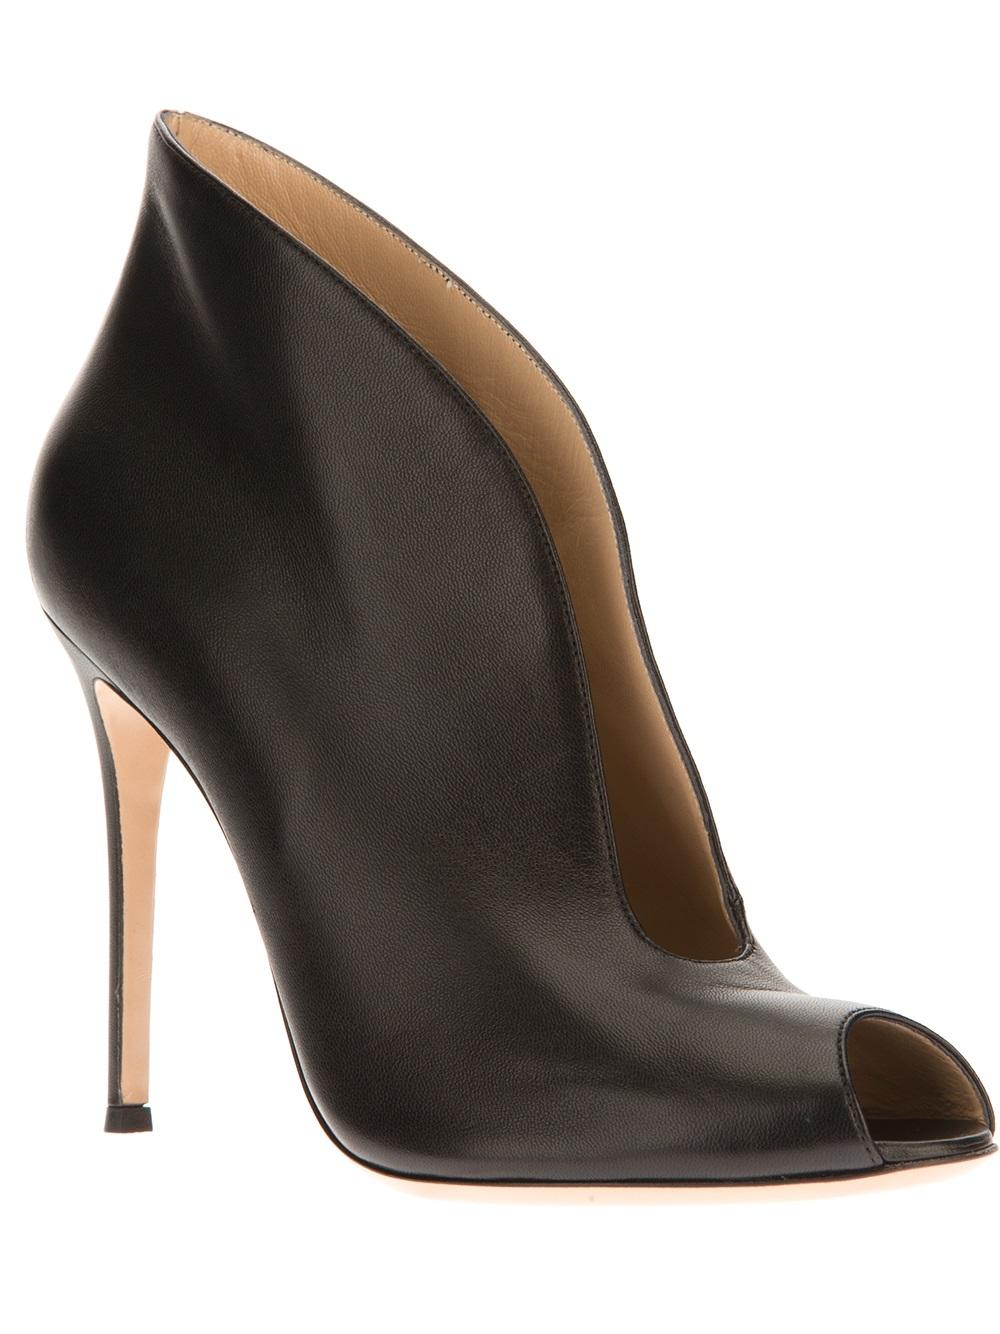 Gianvito Rossi Mens Shoes